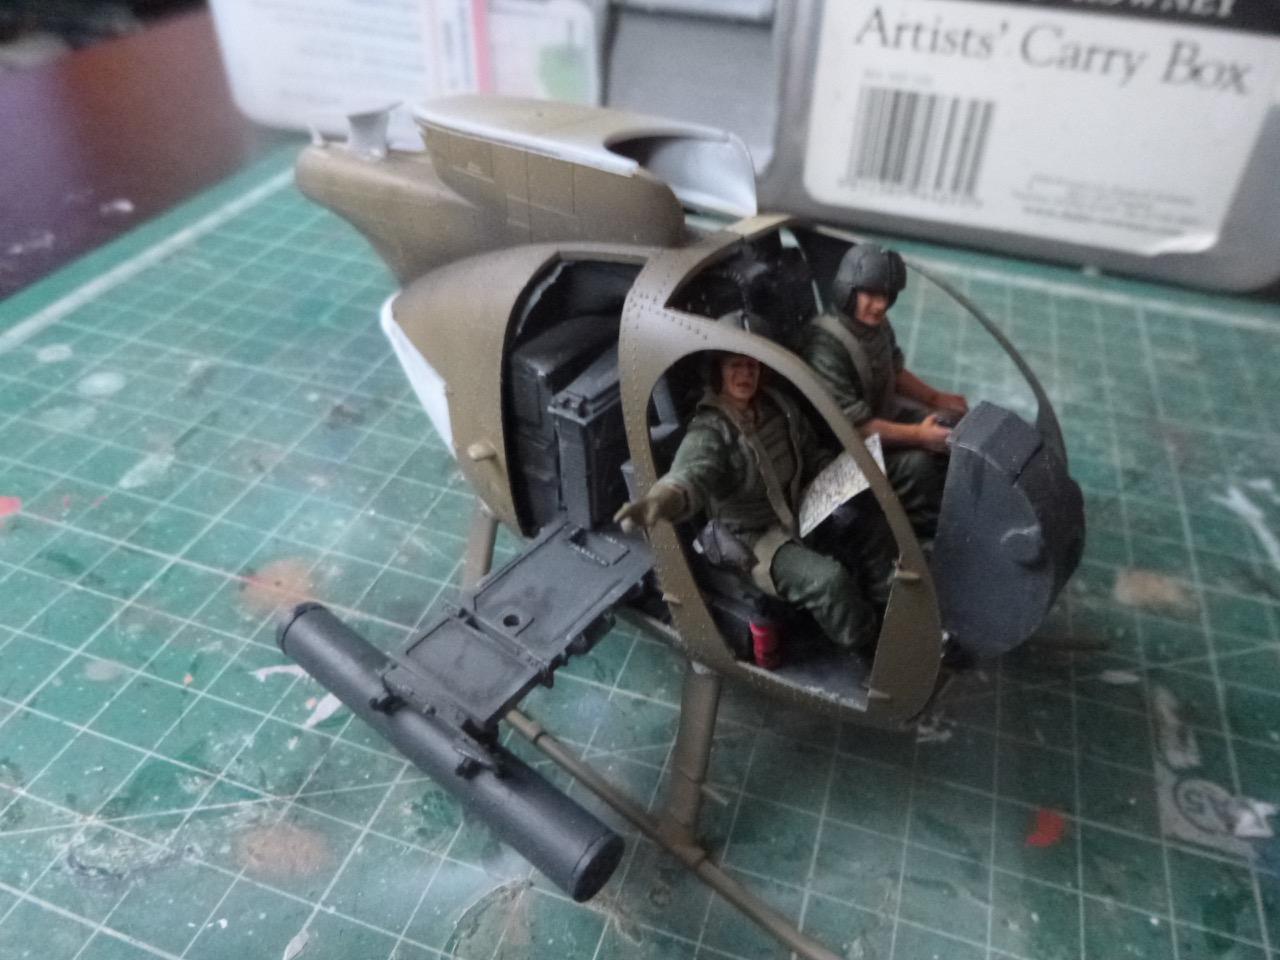 Hélicoptère AH6 little bird + équipage  Dragon 1/35 - Page 2 170627101941117564